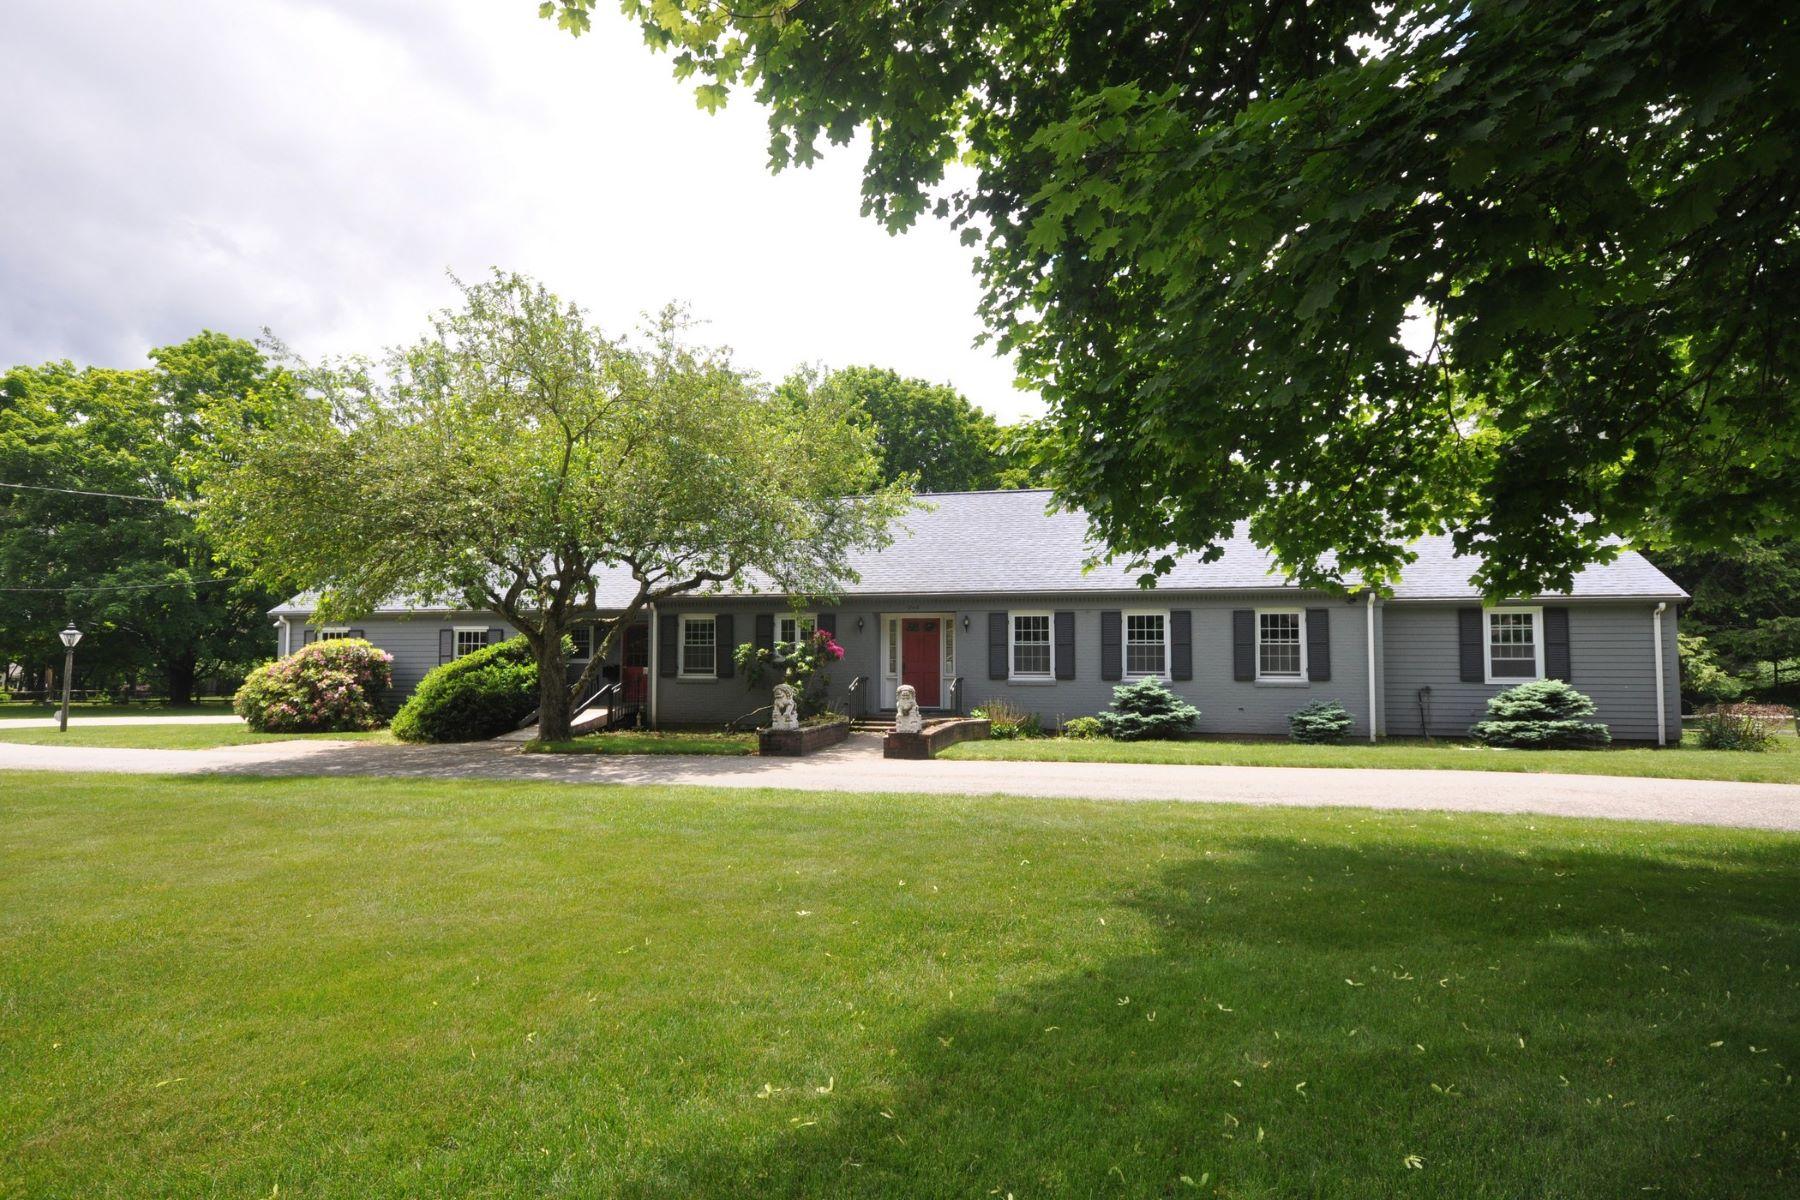 Single Family Homes for Sale at 248 Charles River Street Needham, Massachusetts 02492 United States